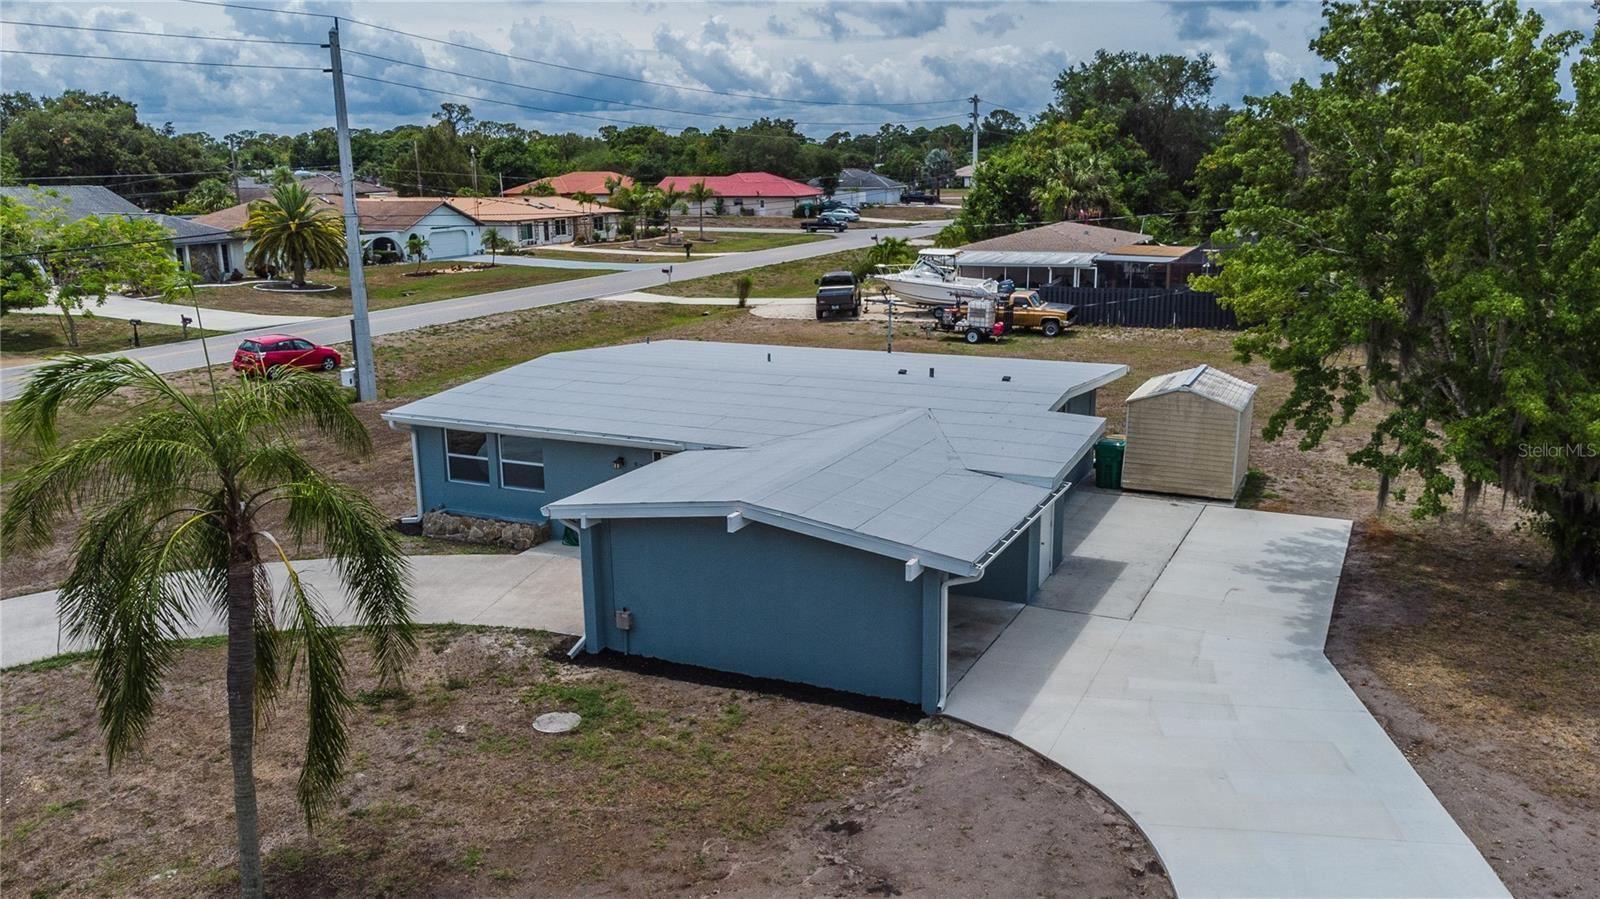 Photo of 979 VICTORIA AVENUE, PORT CHARLOTTE, FL 33948 (MLS # C7444499)